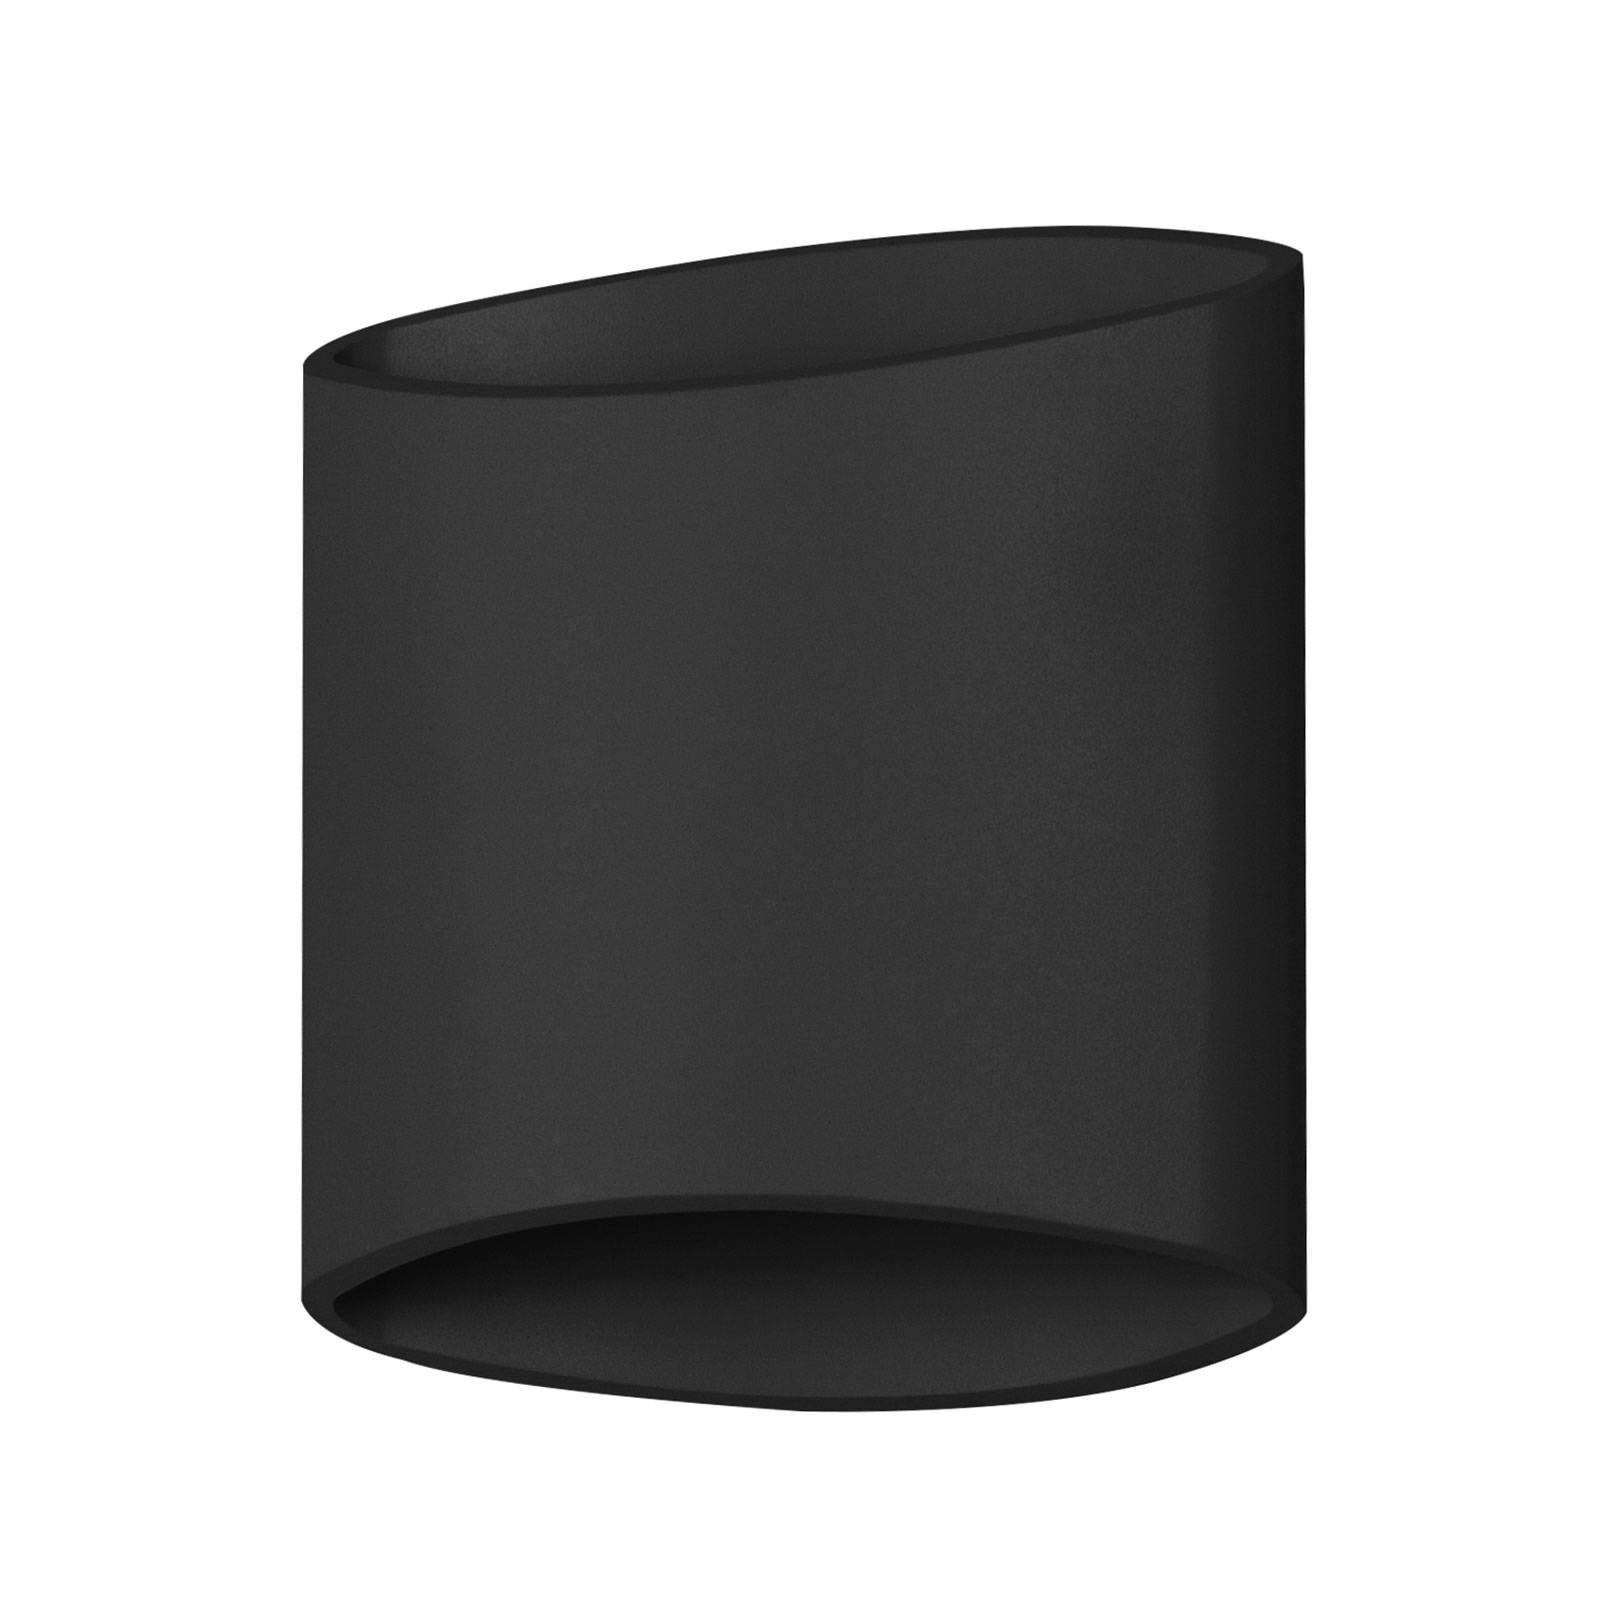 BRUMBERG 10090 LED-Wandleuchte, schwarz